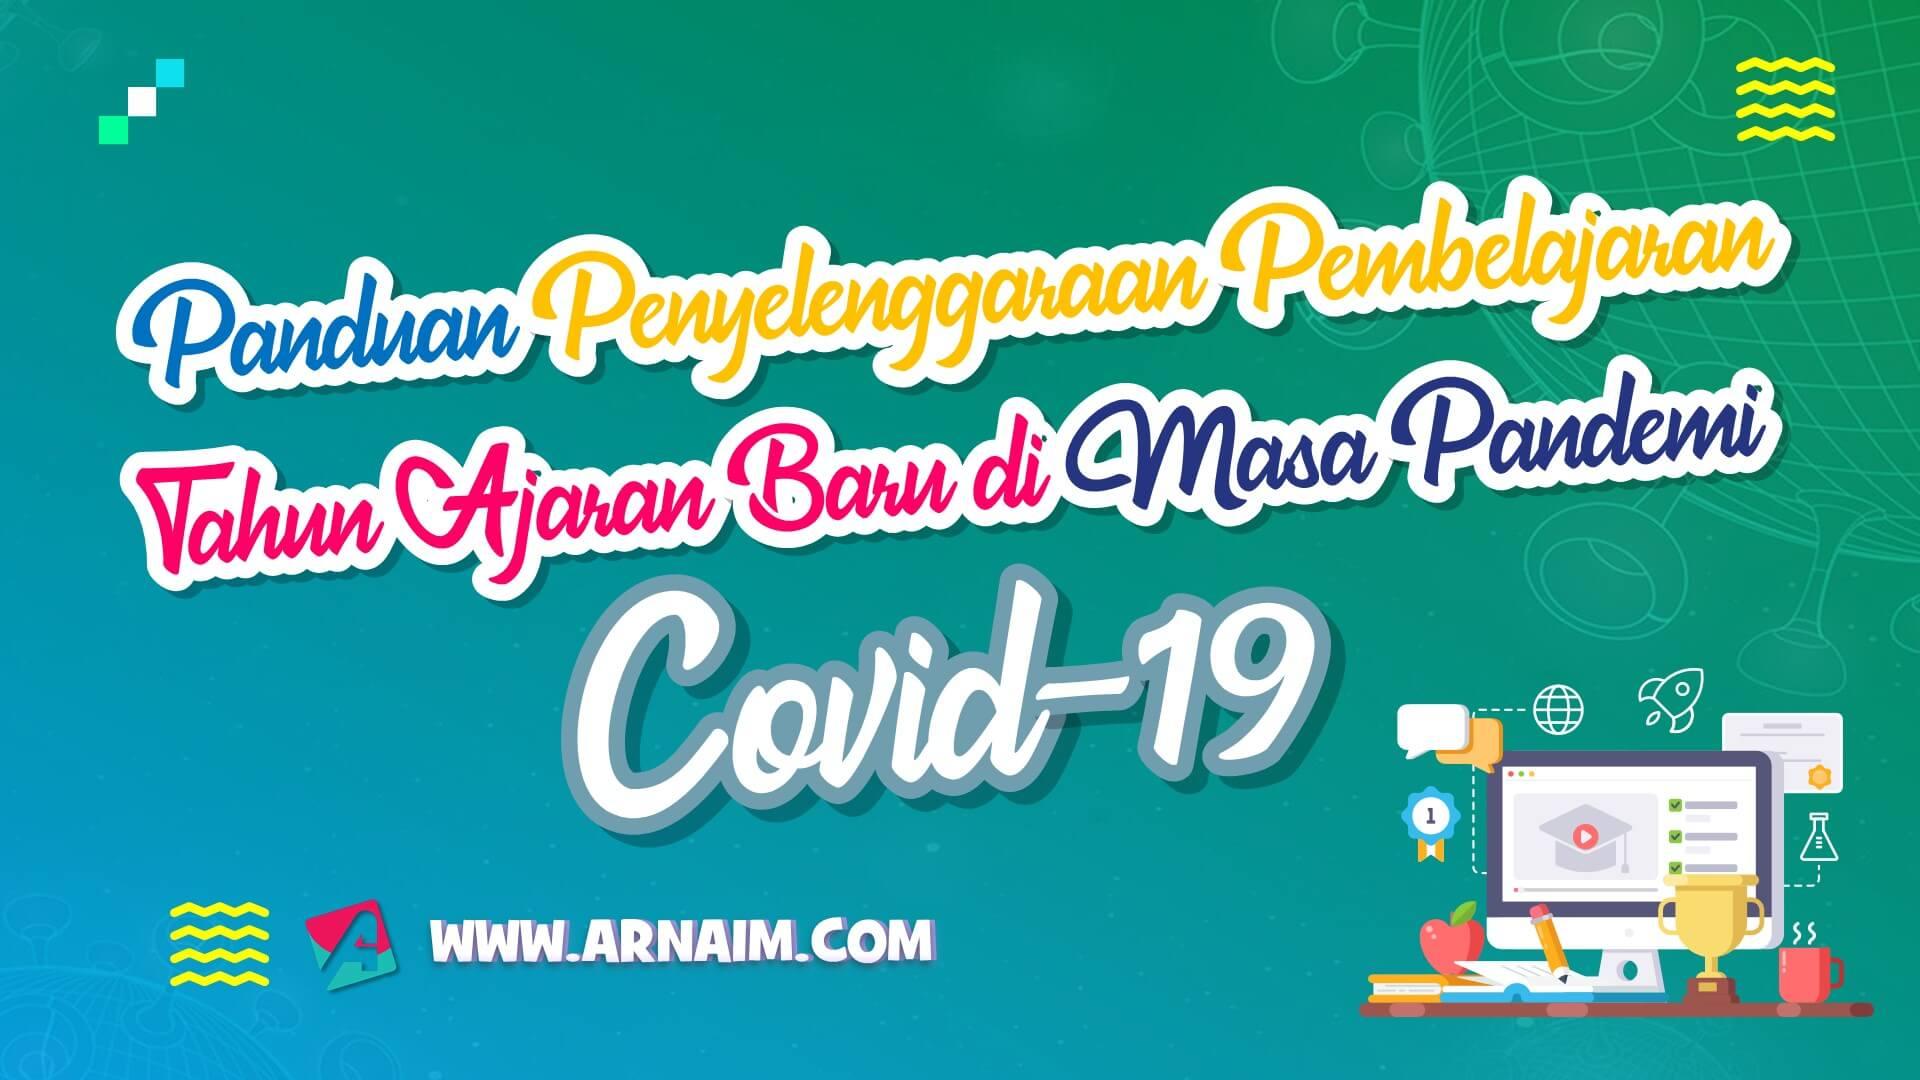 Arnaim.com - Panduan Penyelenggaraan Pembelajaran Tahun Ajaran Baru Di Masa Pandemi Covid-19 -1